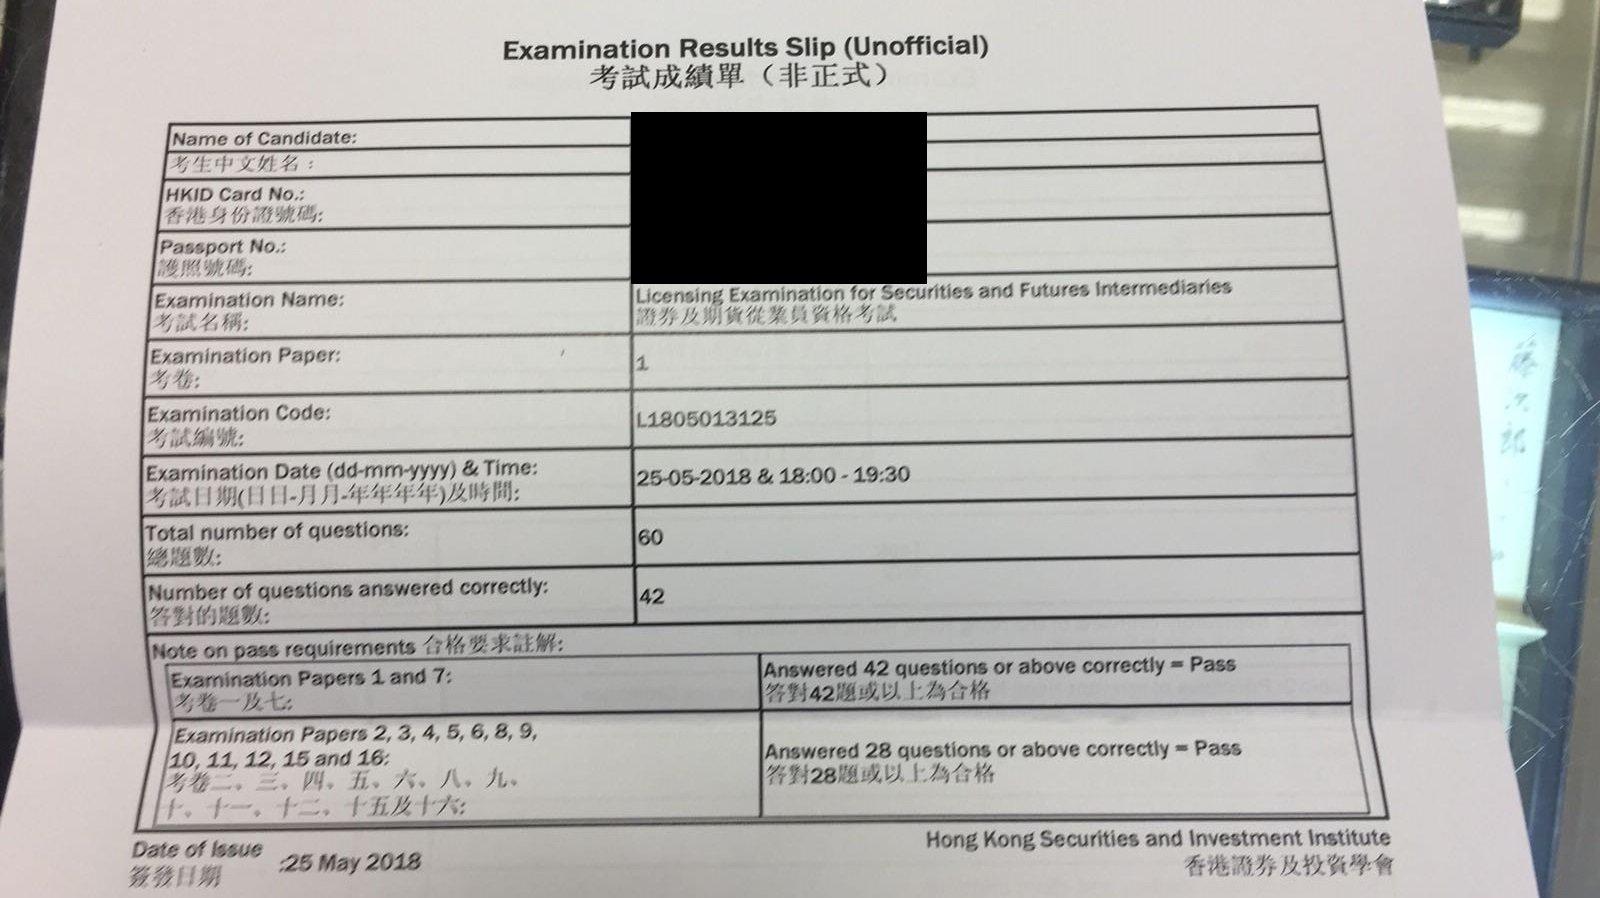 HHYT 25/5/2018 LE Paper 1 證券期貨從業員資格考試卷一 Pass